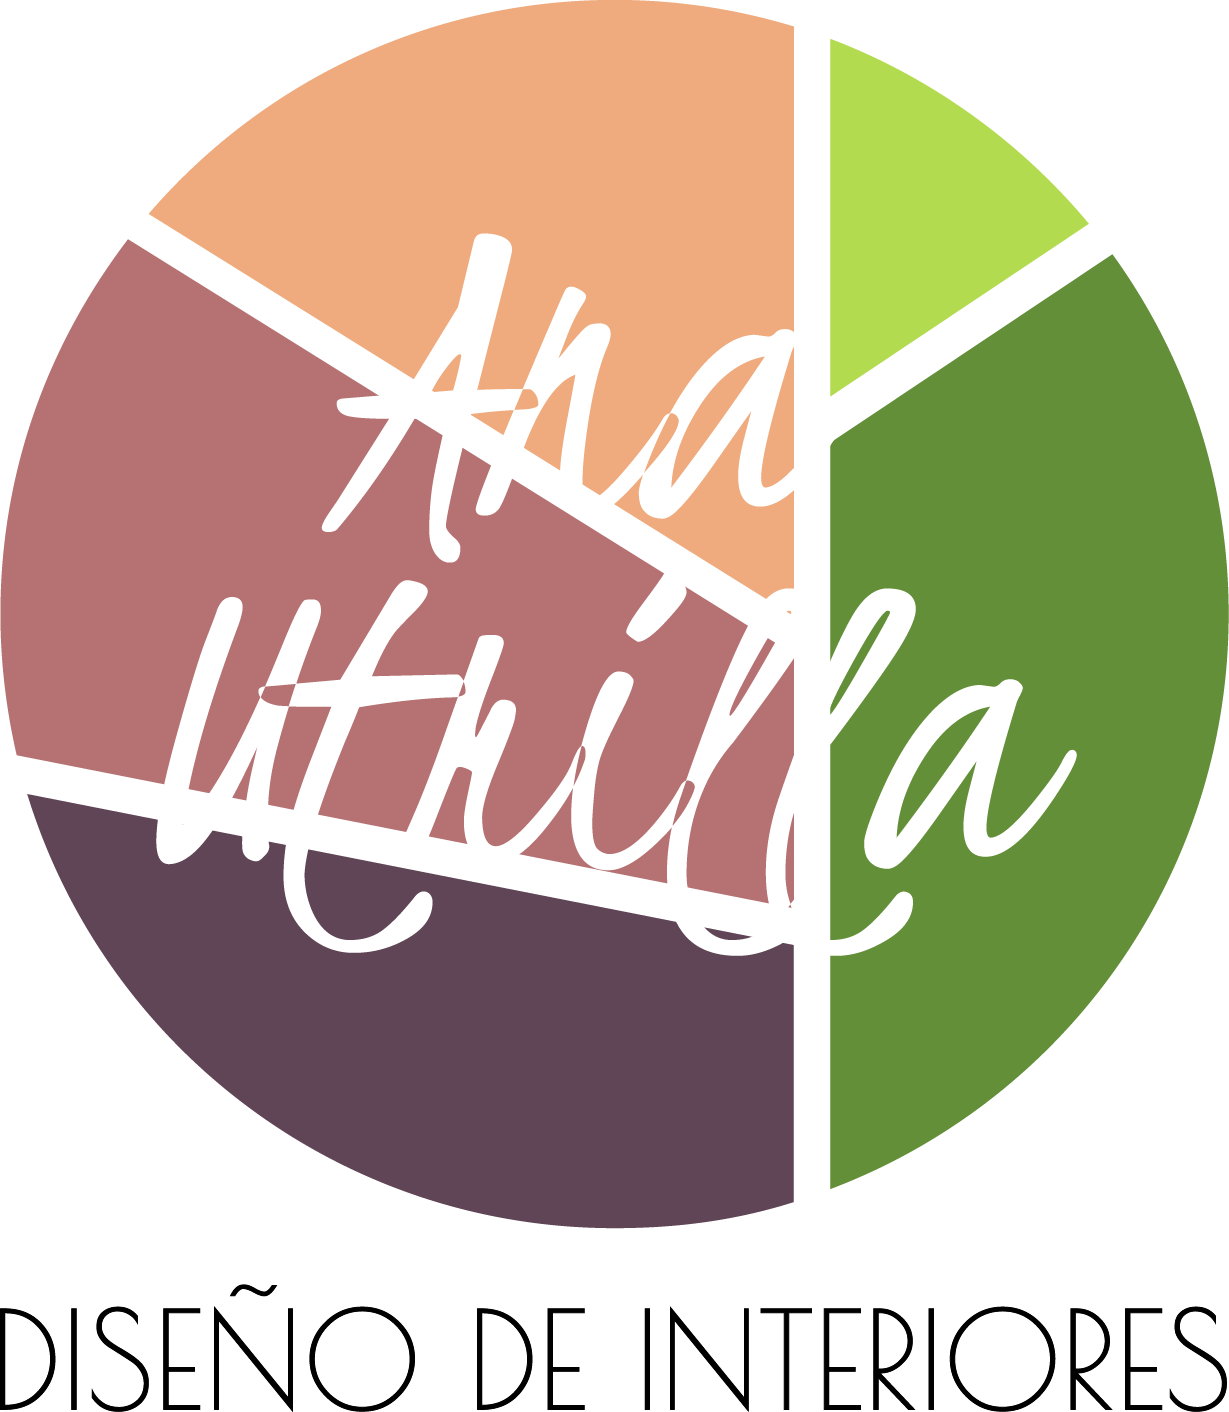 Ana Utrilla | Diseño De Interiores